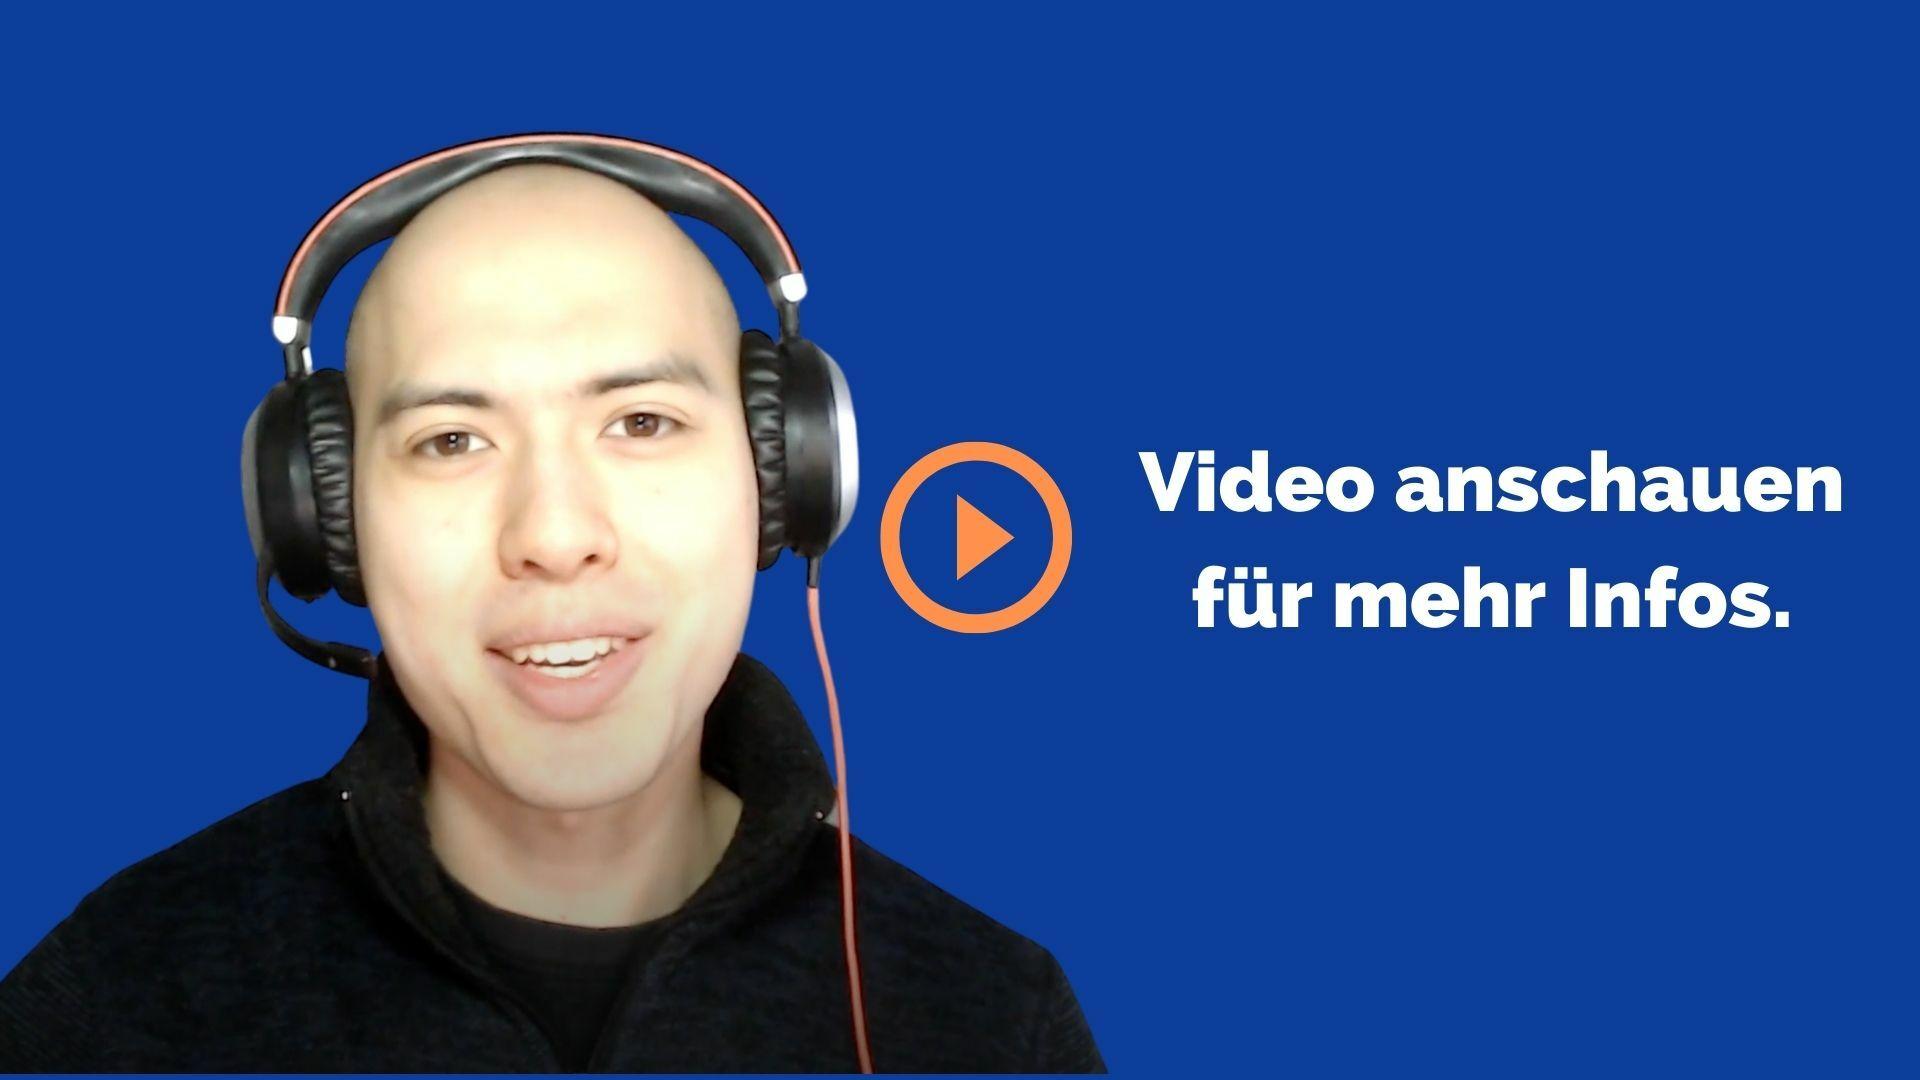 Videopitch